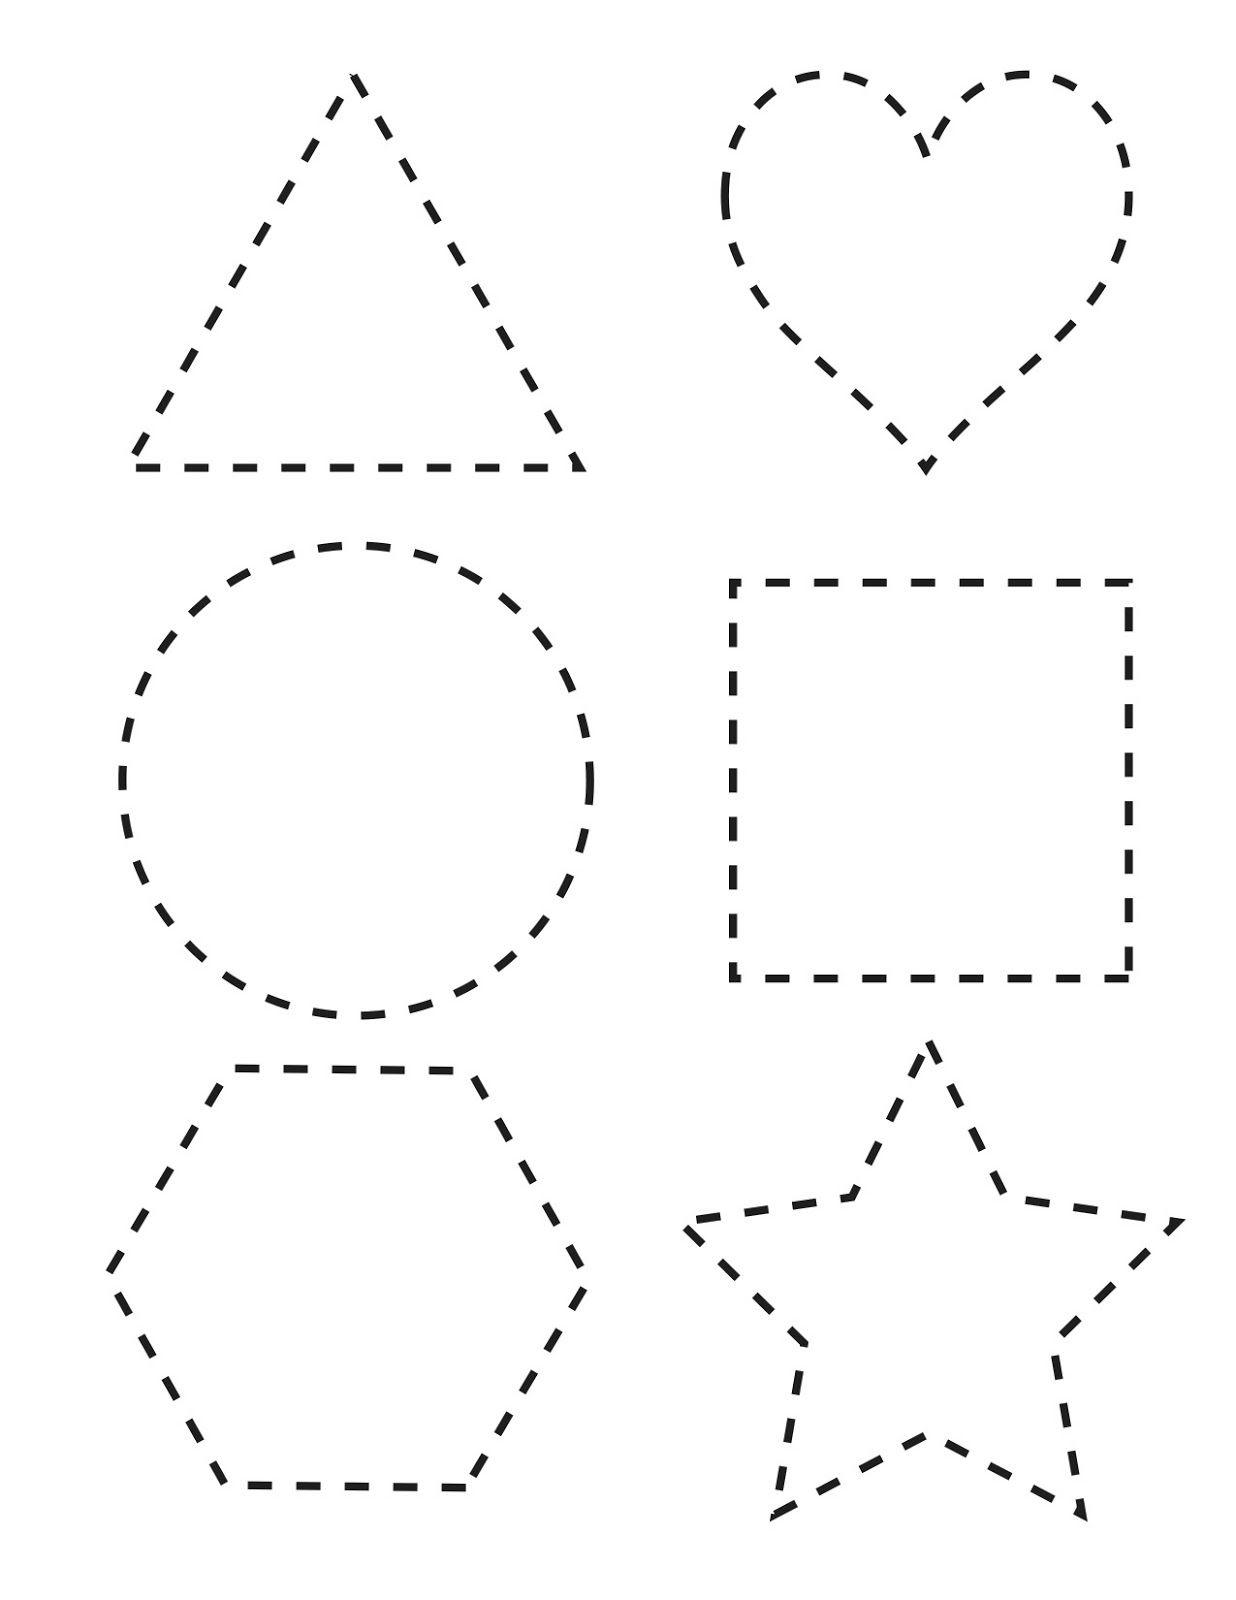 Preschool Tracing Worksheets